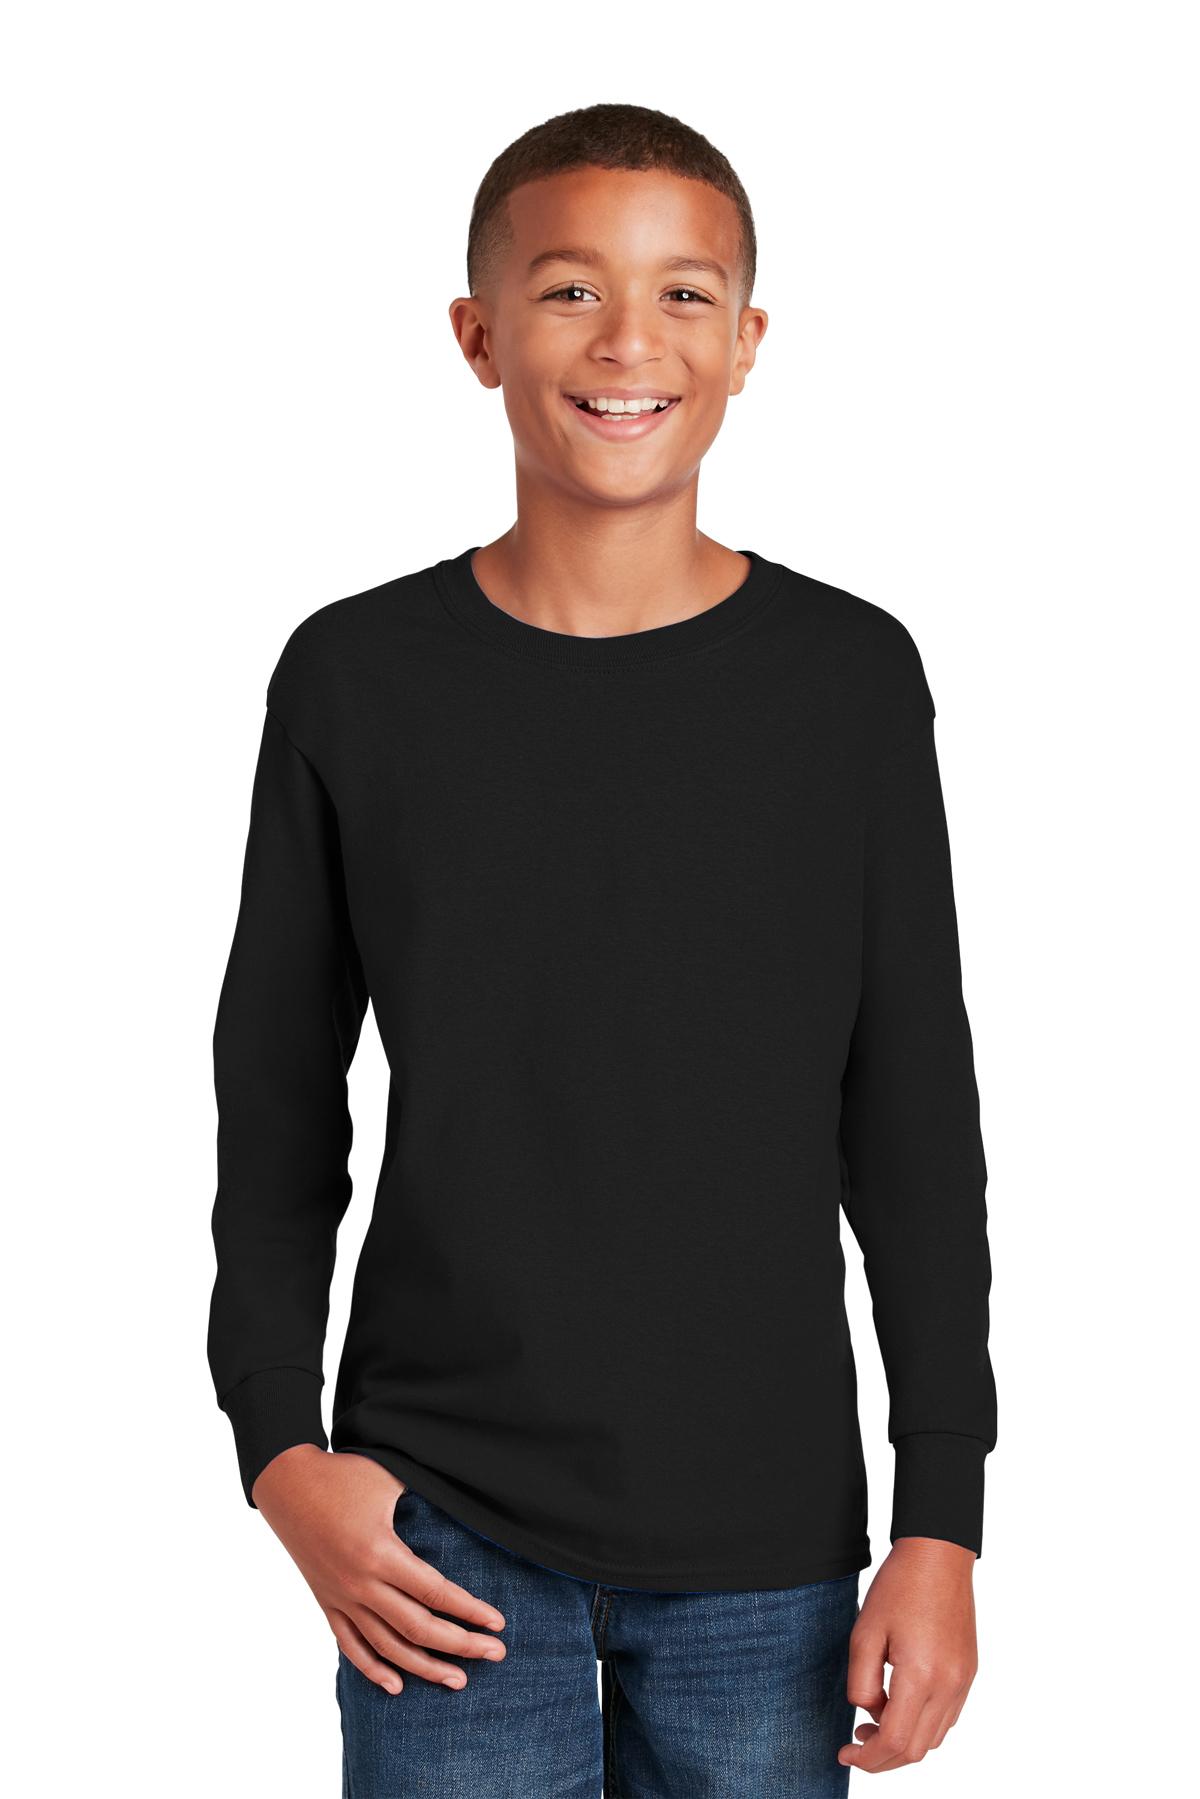 Gildan Youth Heavy Cotton 100% Cotton Long Sleeve T-Shirt